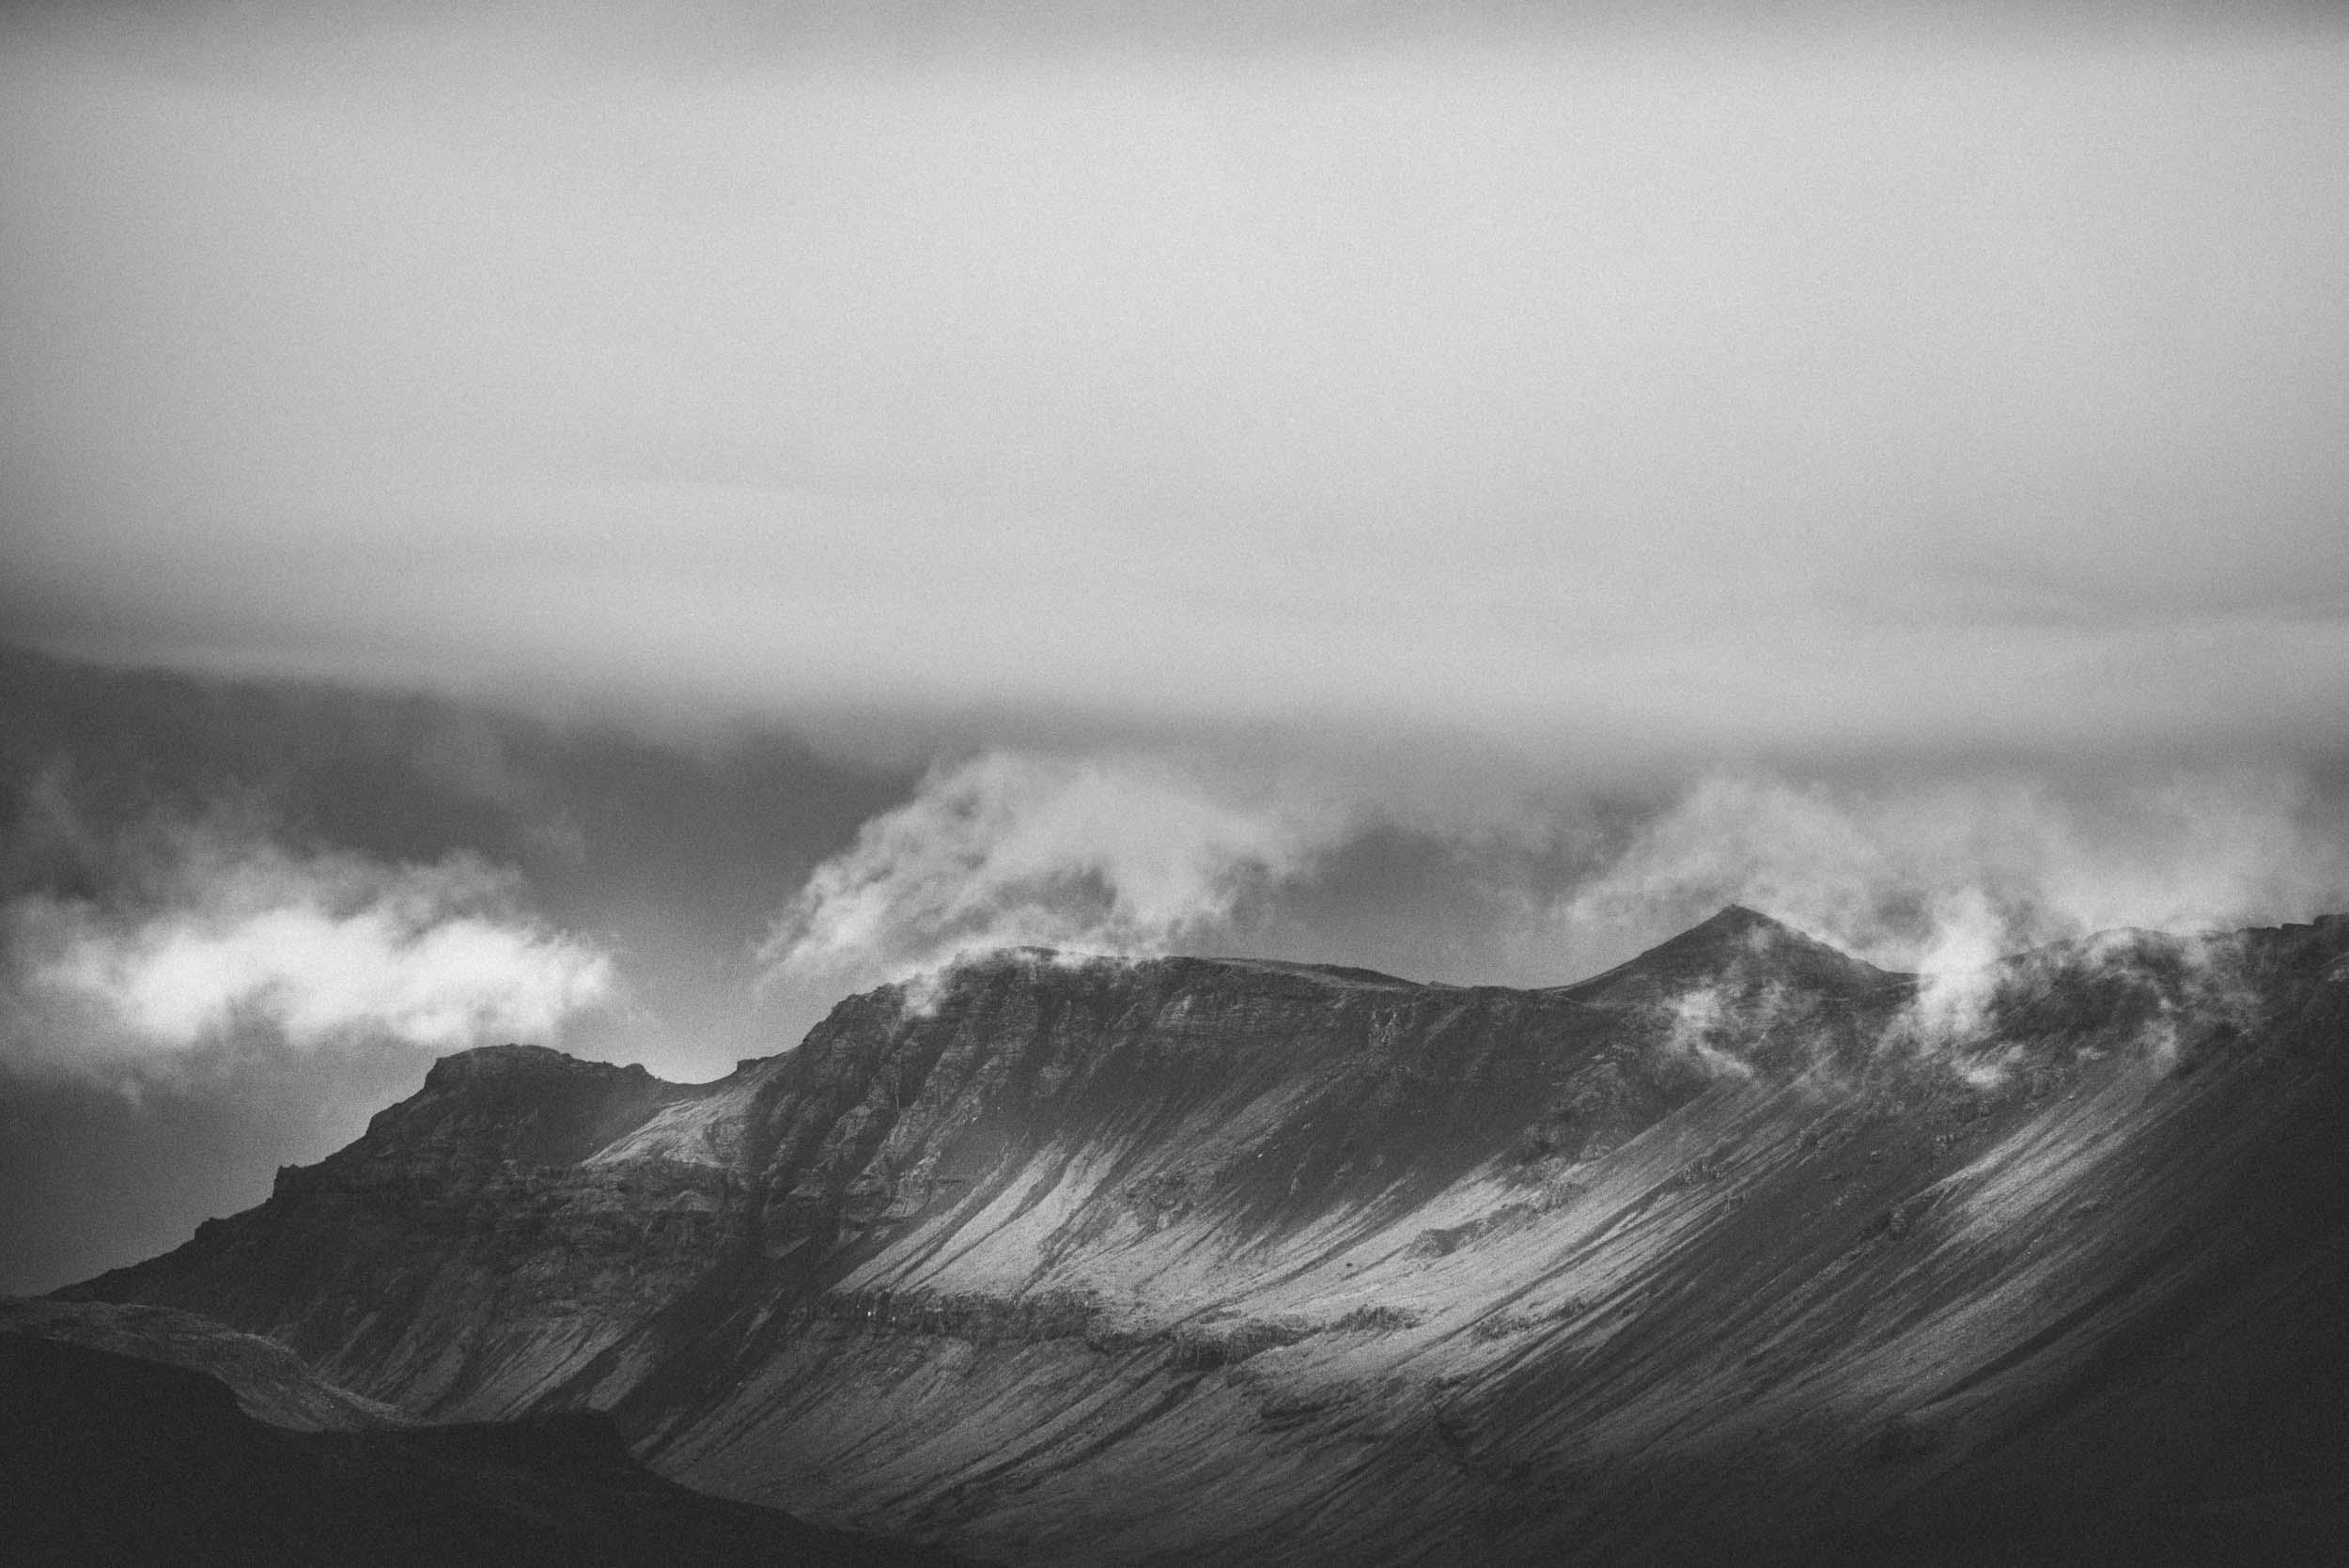 scouting-iceland-18.jpg